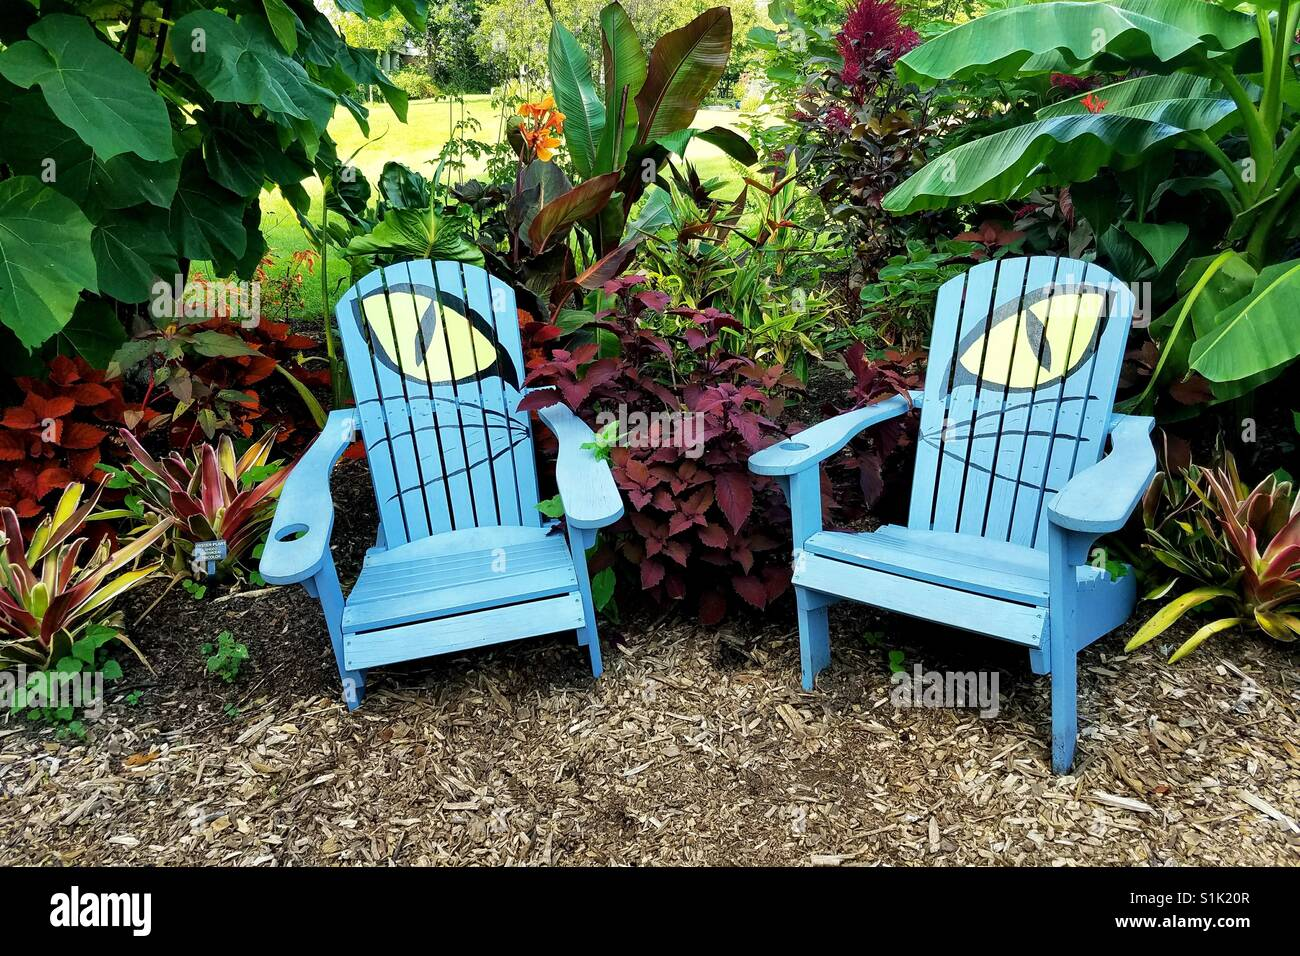 Decorazioni In Legno Per Giardino : Cat eye sedie da giardino in meadowlark giardini vienna virginia